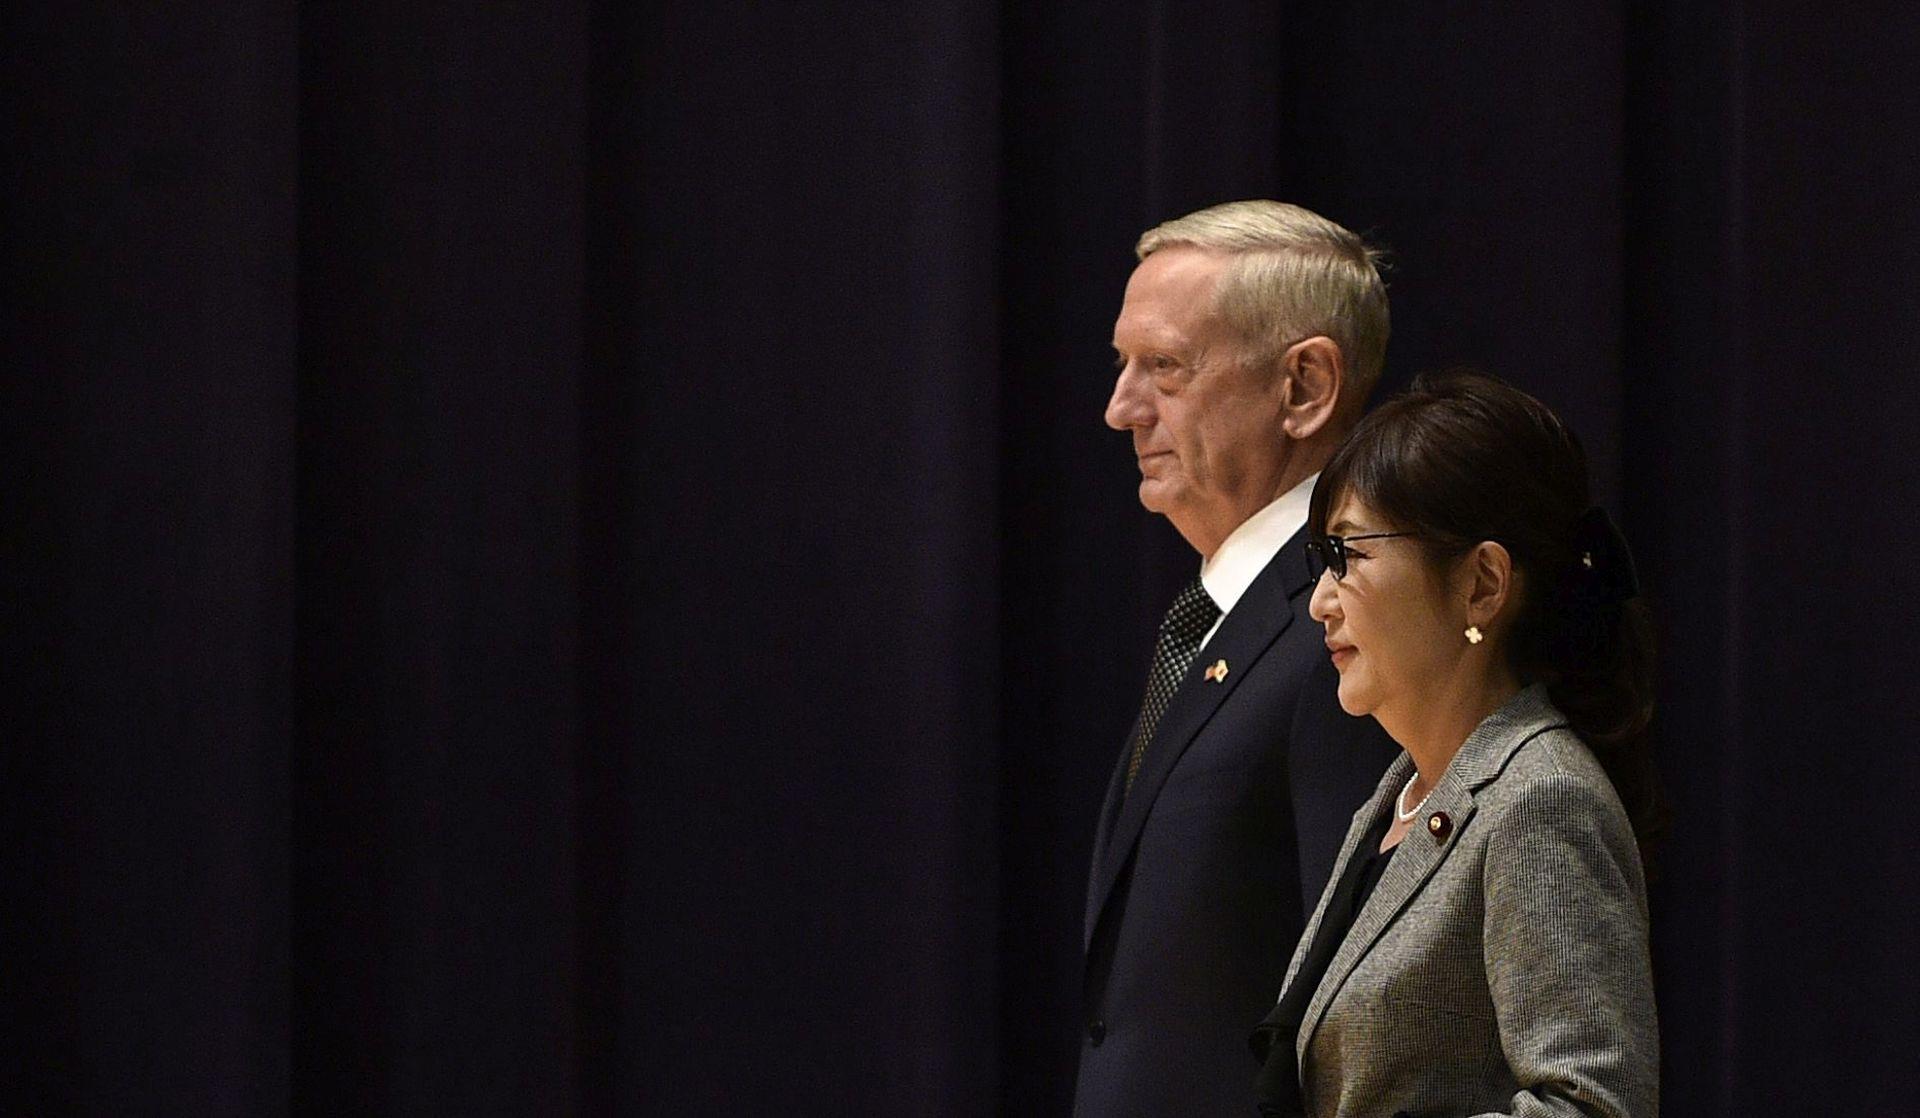 Peking optužio Washington da destabilizira regiju